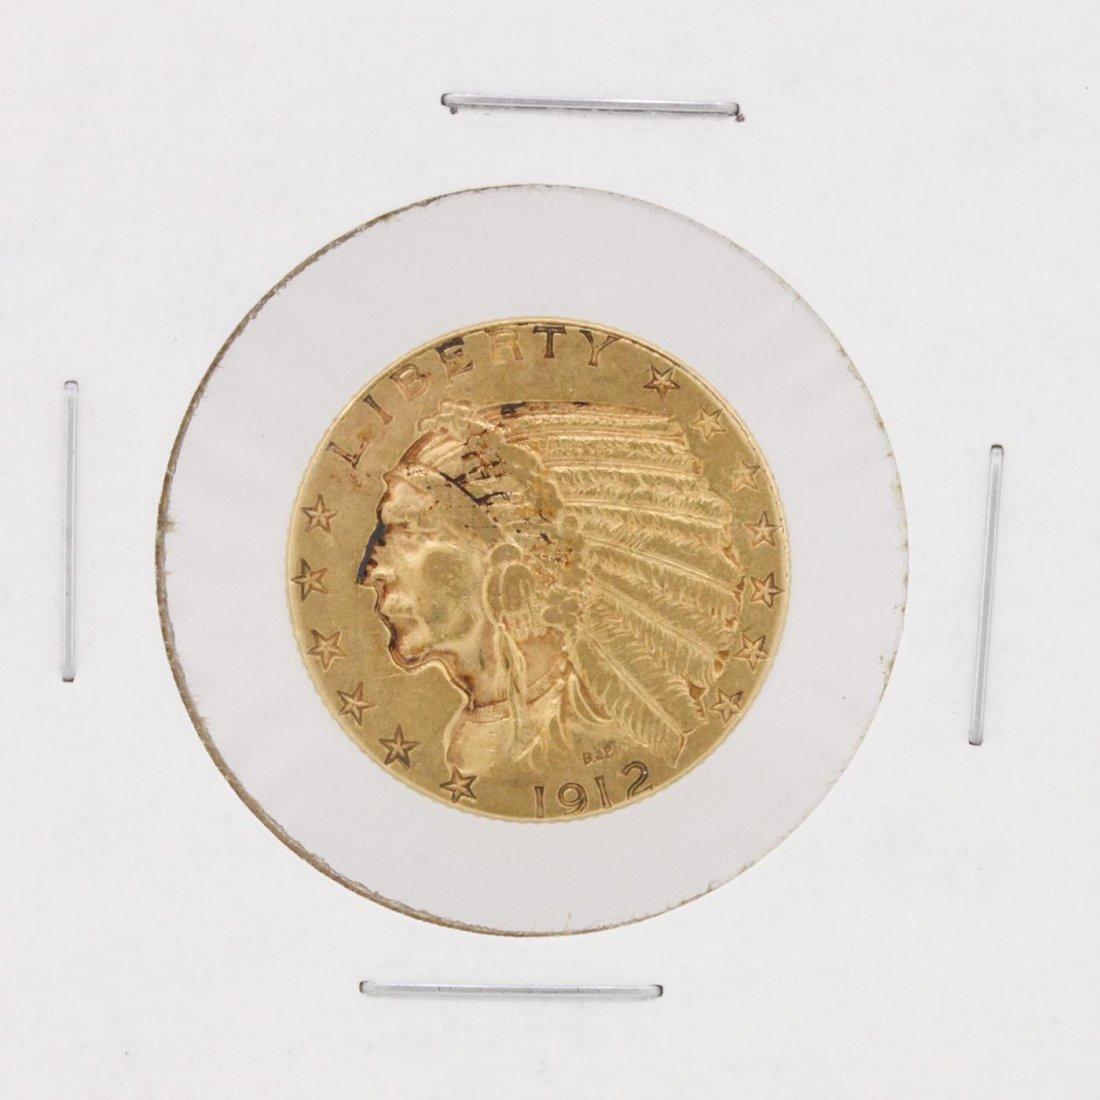 1912 $5 XF Indian Head Half Eagle Coin